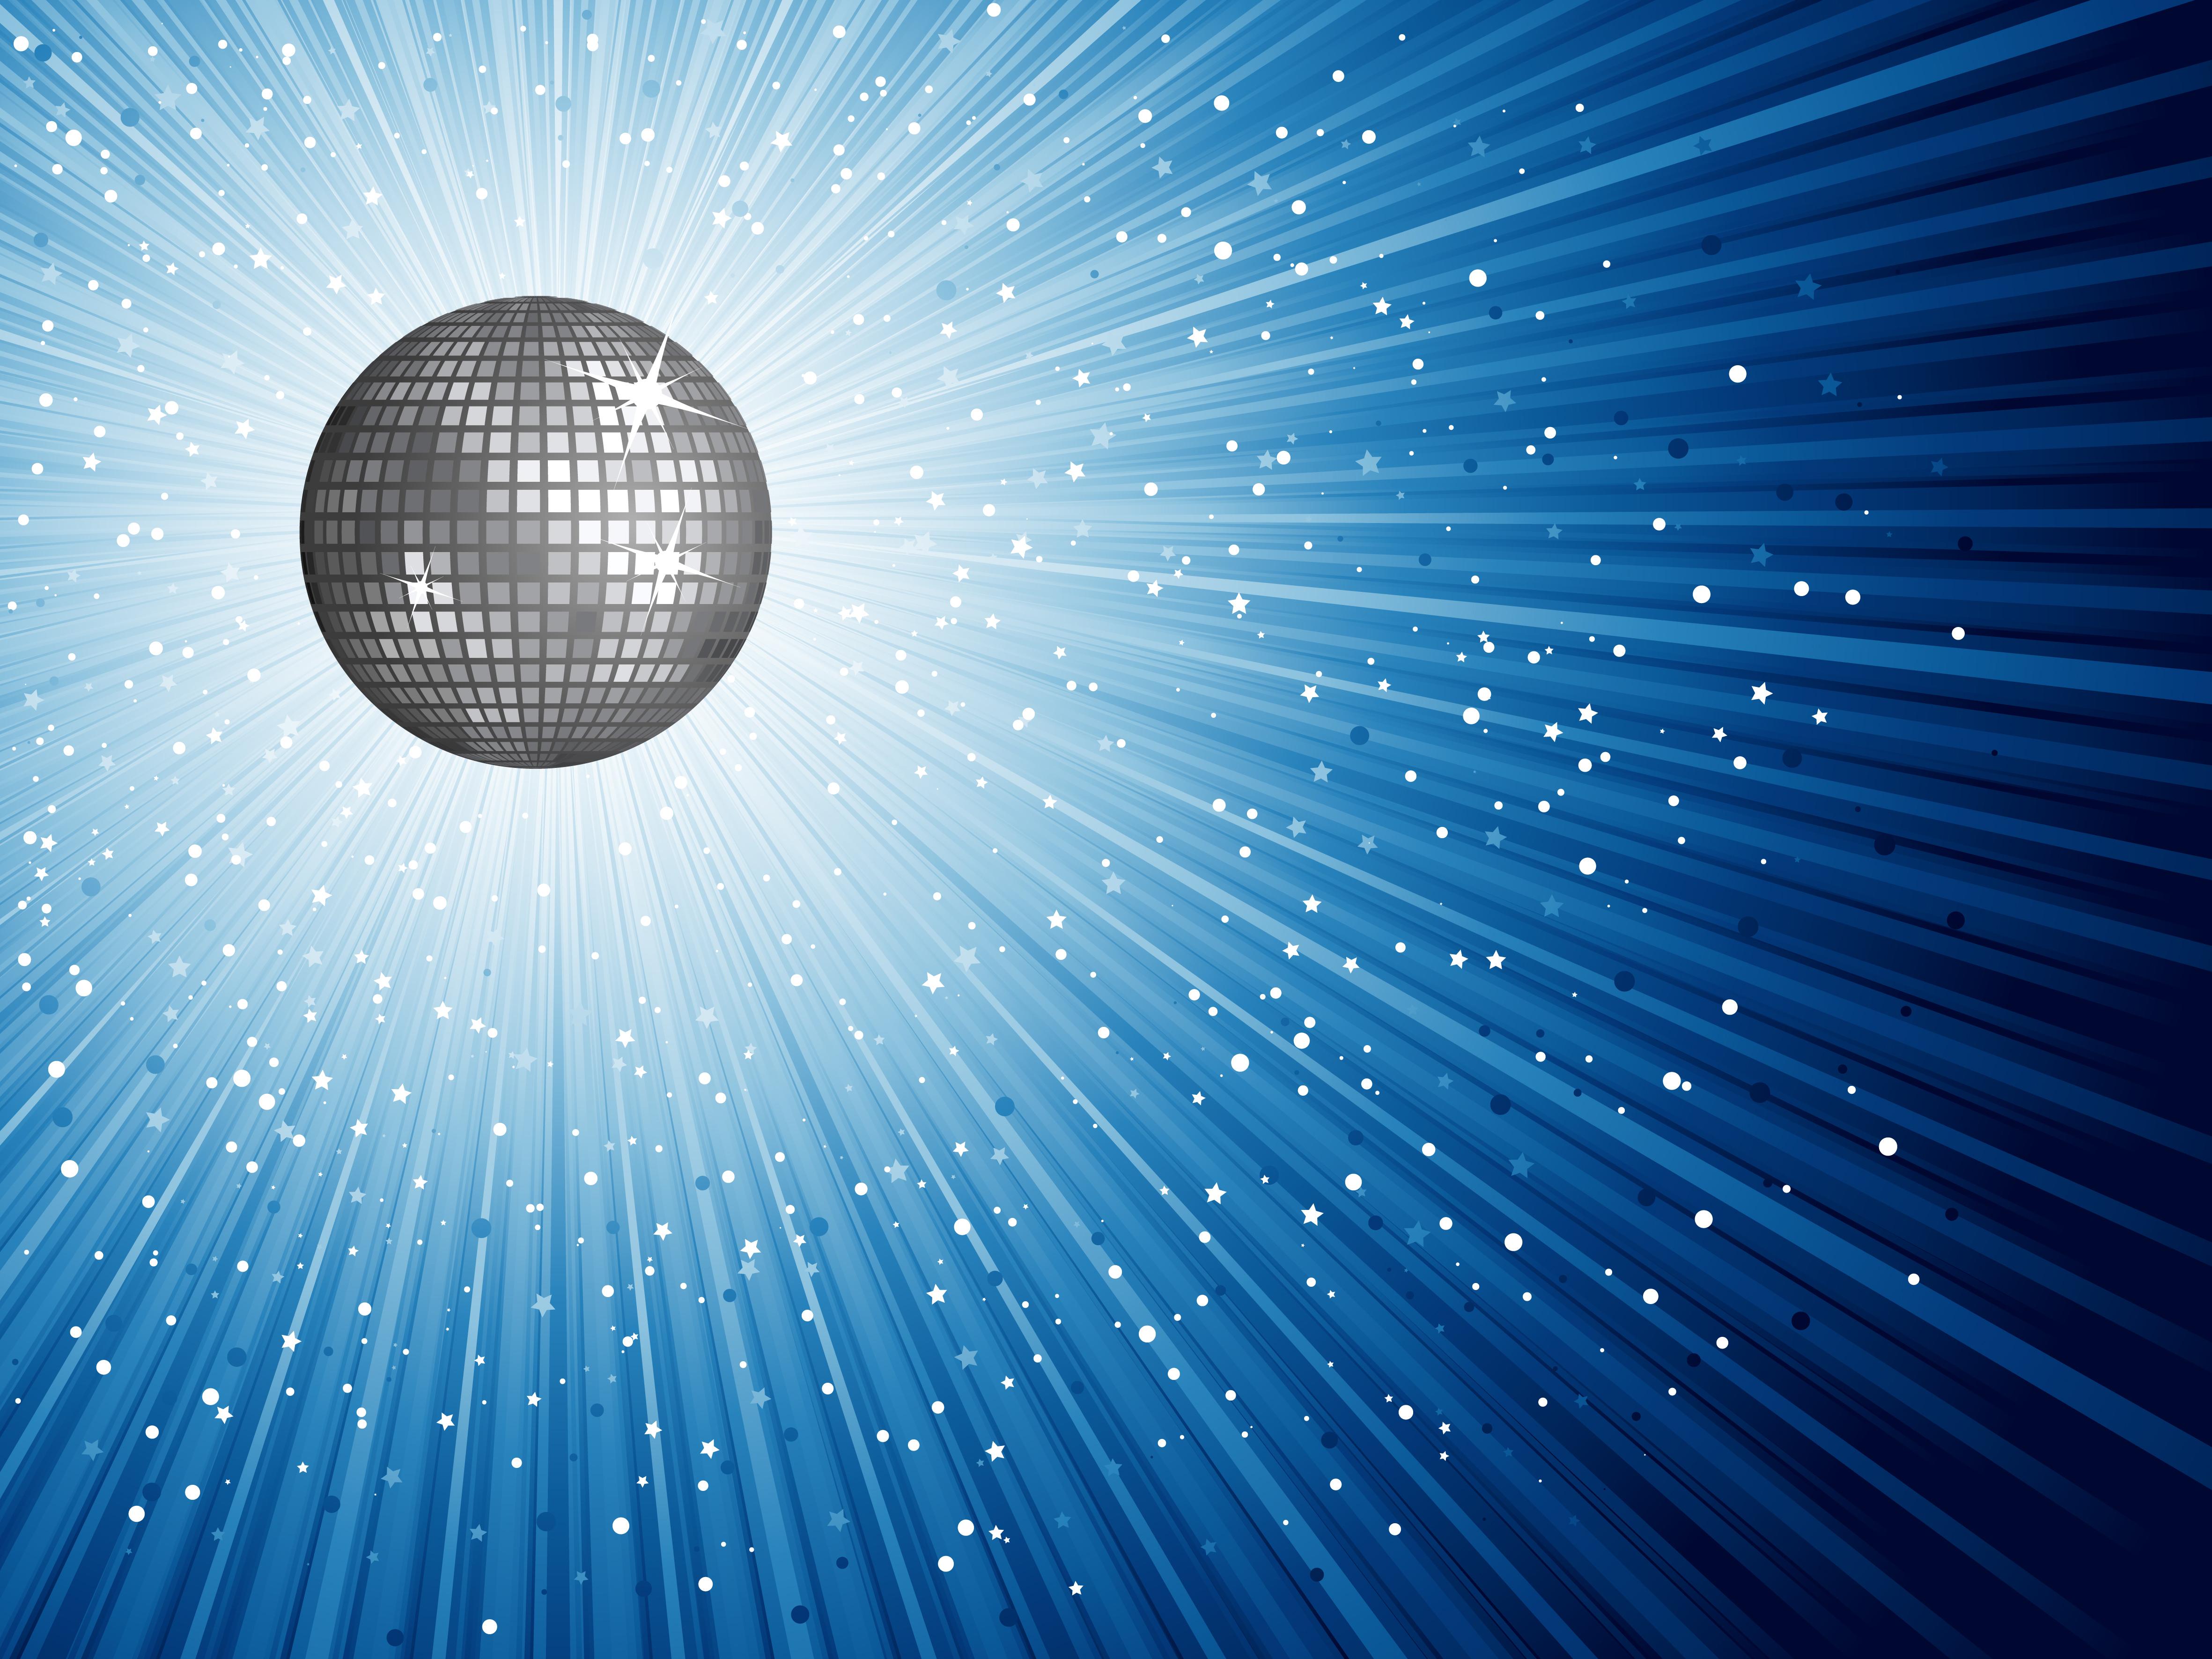 Background Disco Free Vector Art 70990 Free Downloads